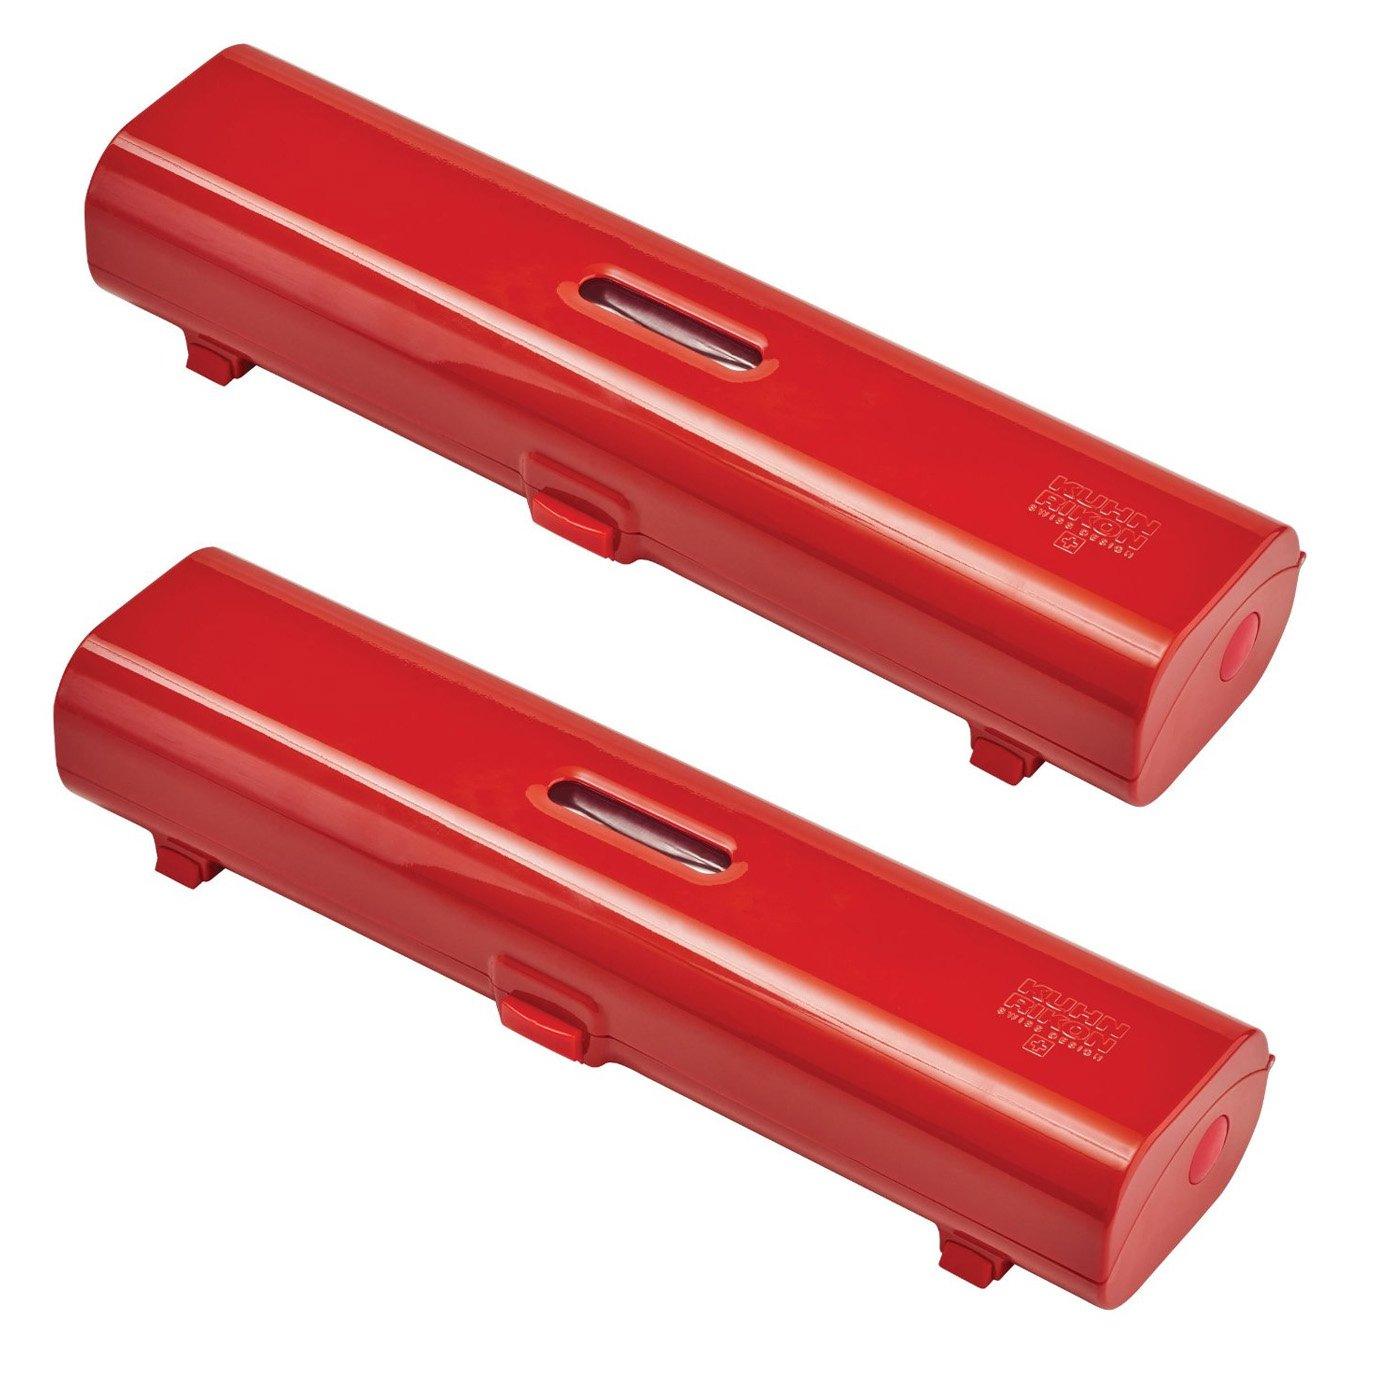 Kuhn Rikon Foil & Plastic Wrap Dispenser Set Of 2, Red